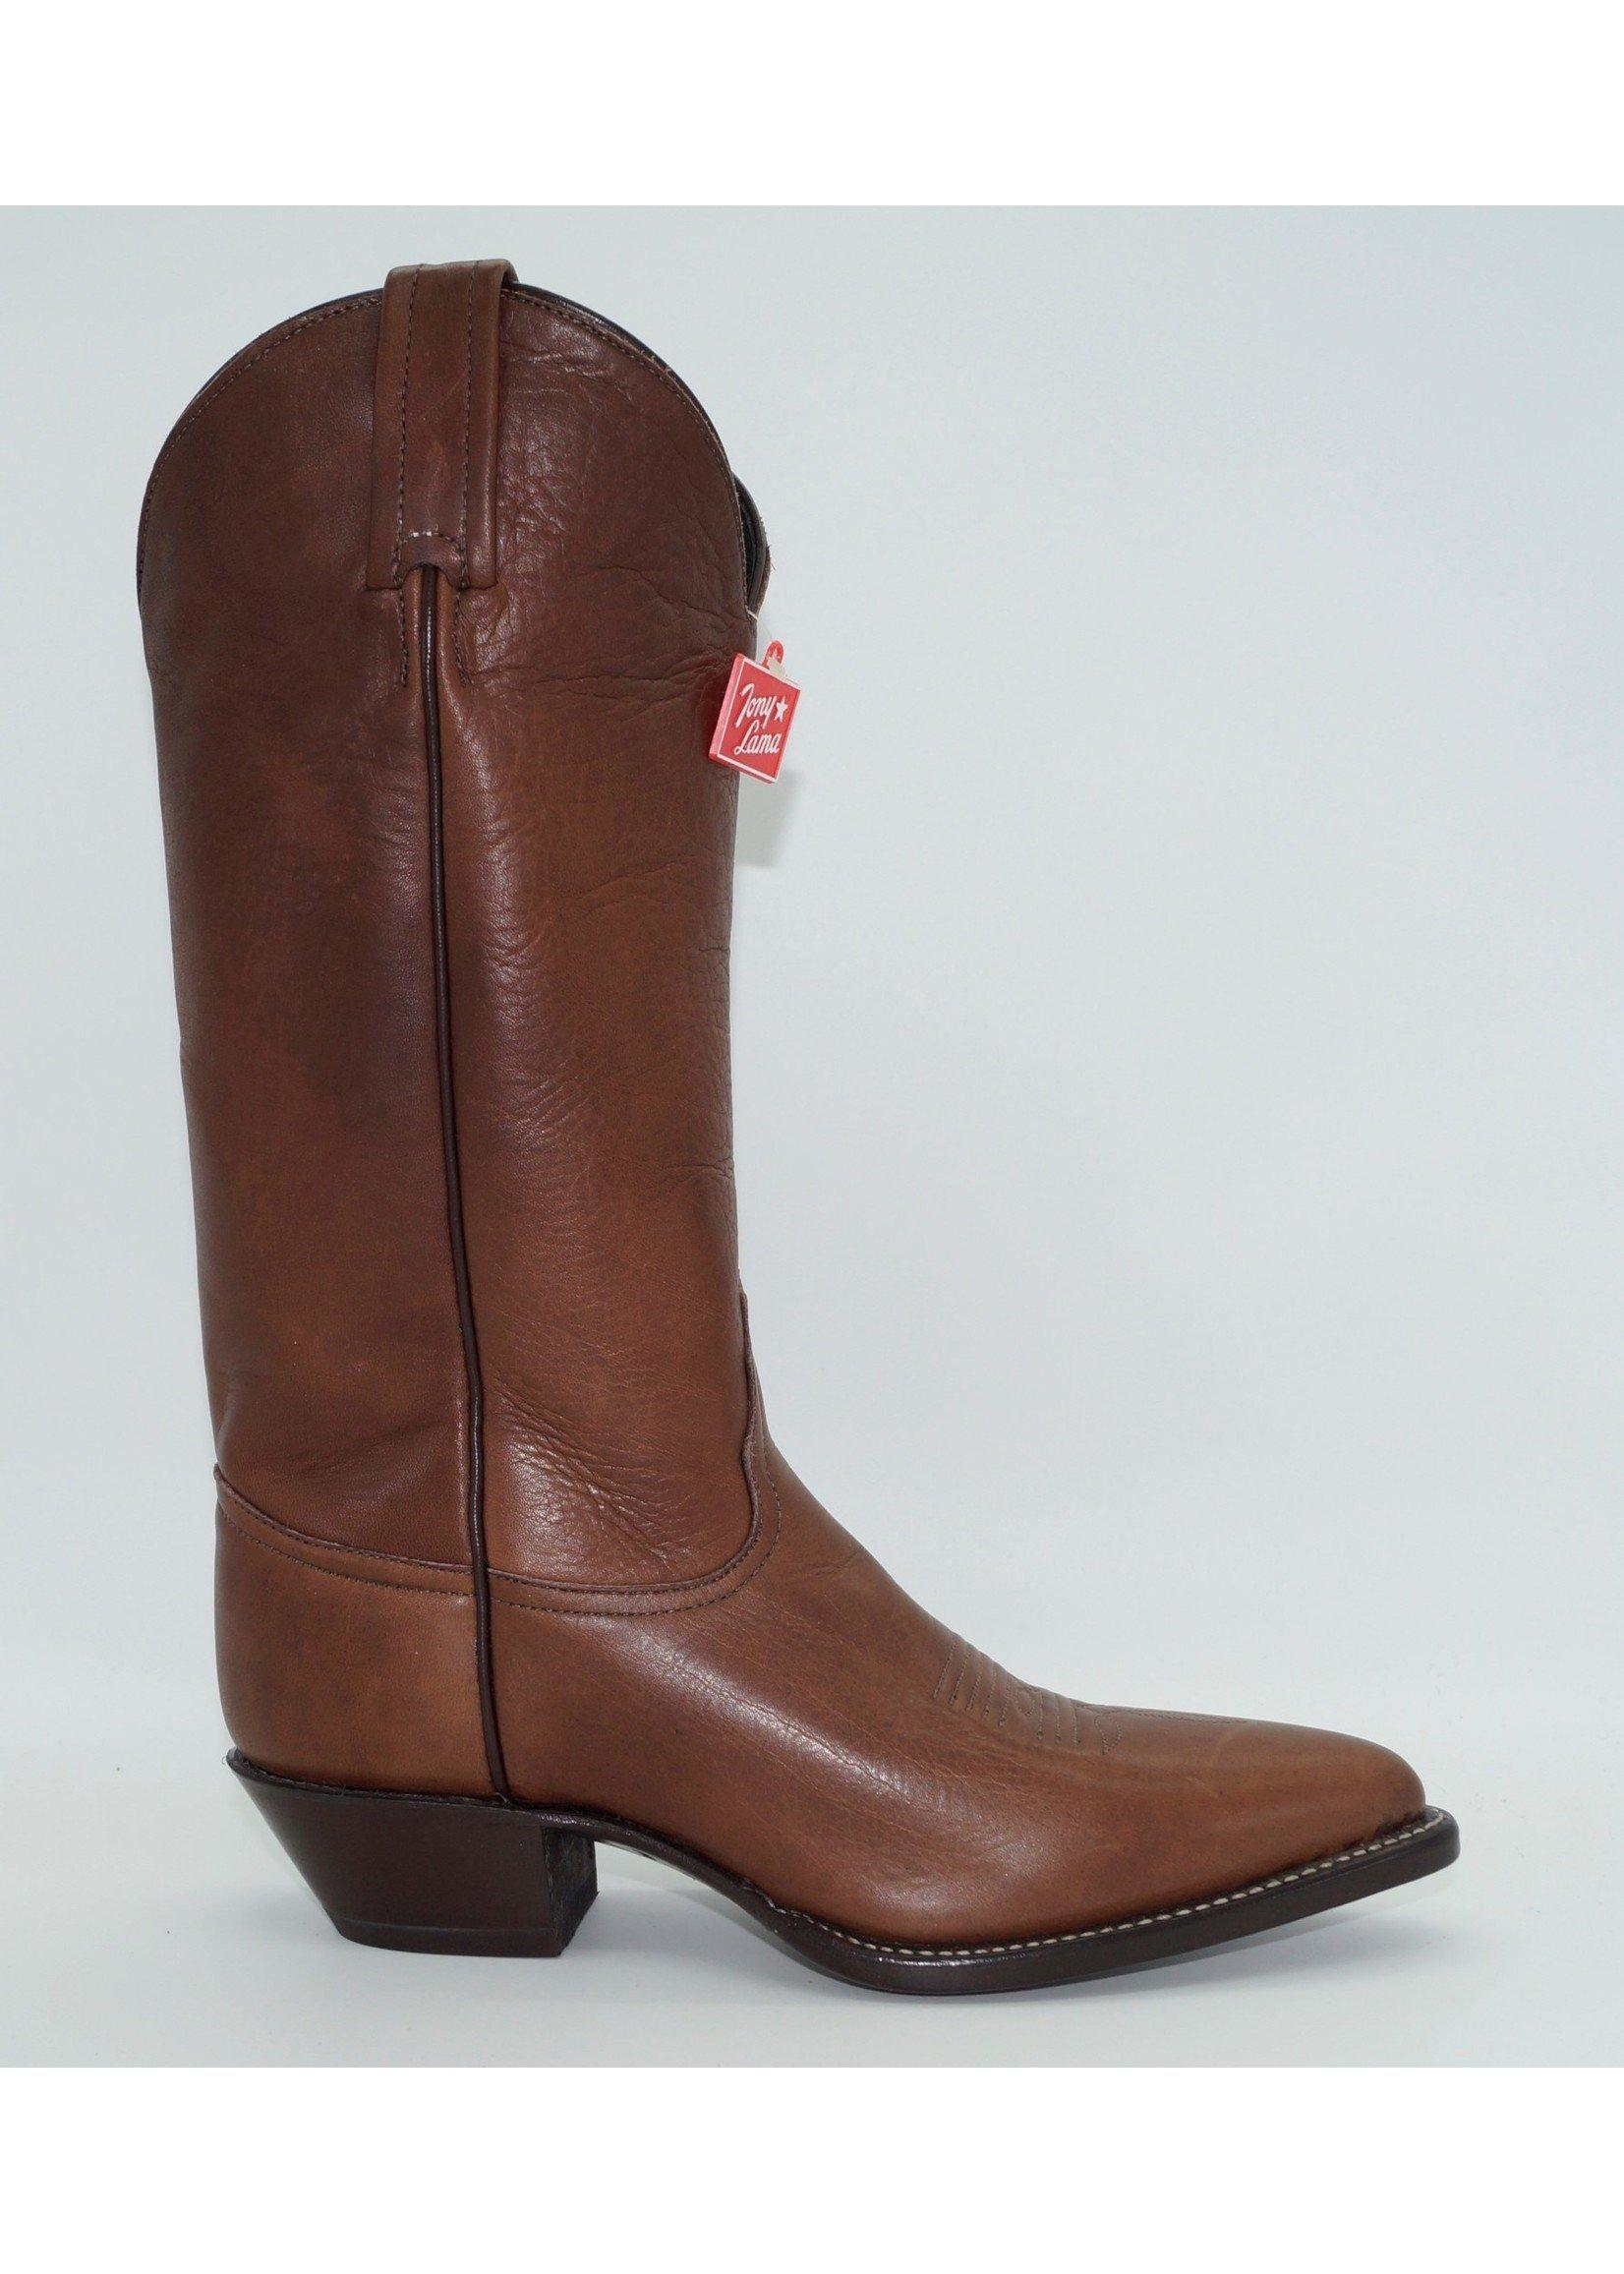 Tony Lama Women's Brown Western Boots J10133L